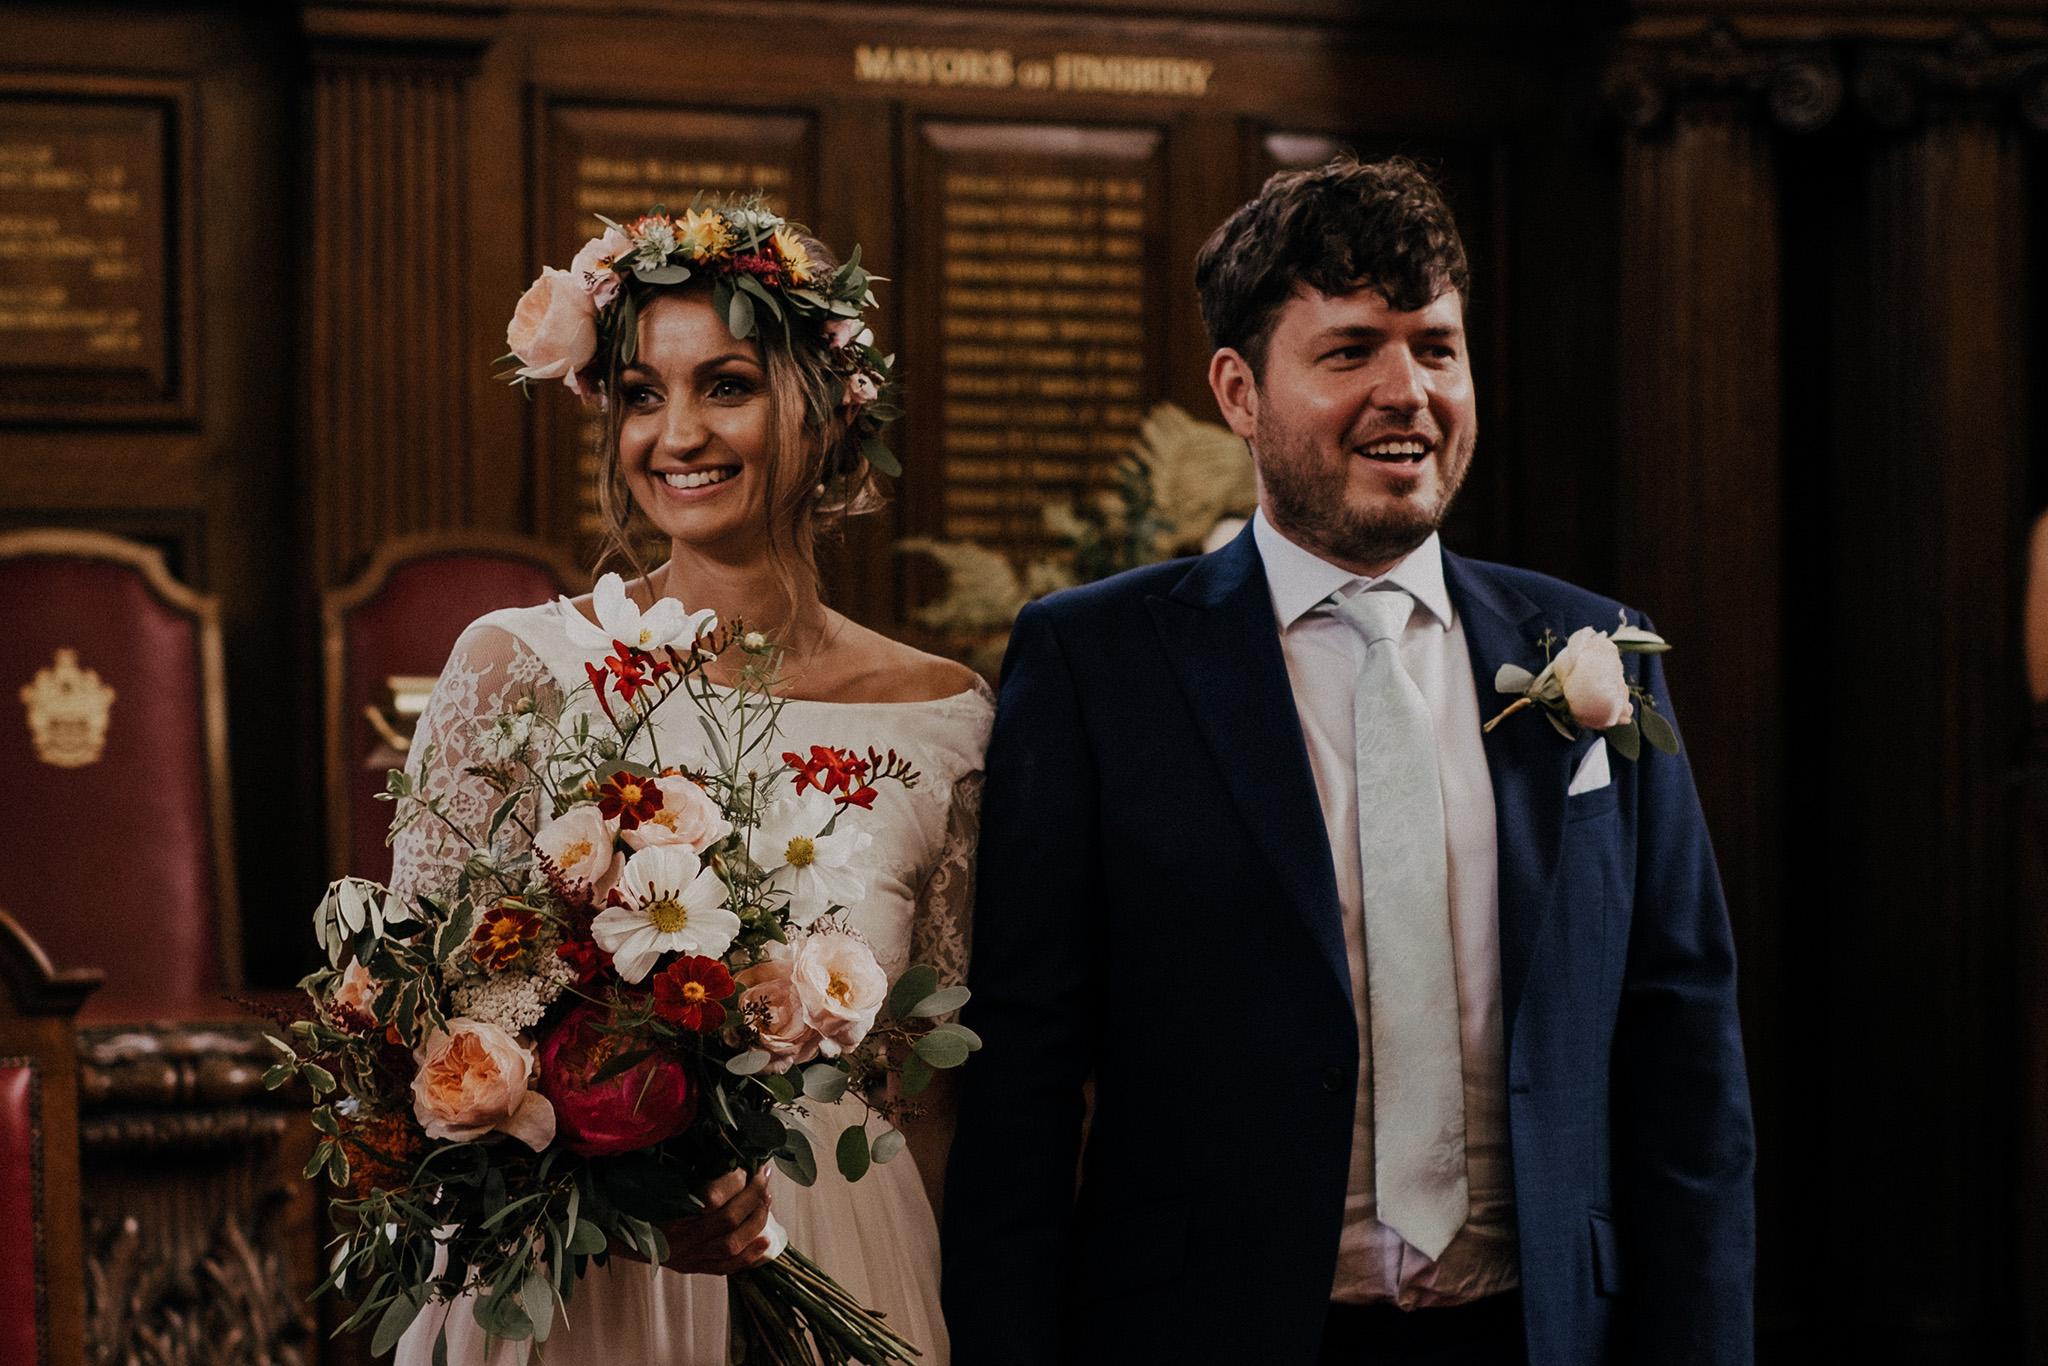 Islington-town-hall-wedding46.jpg